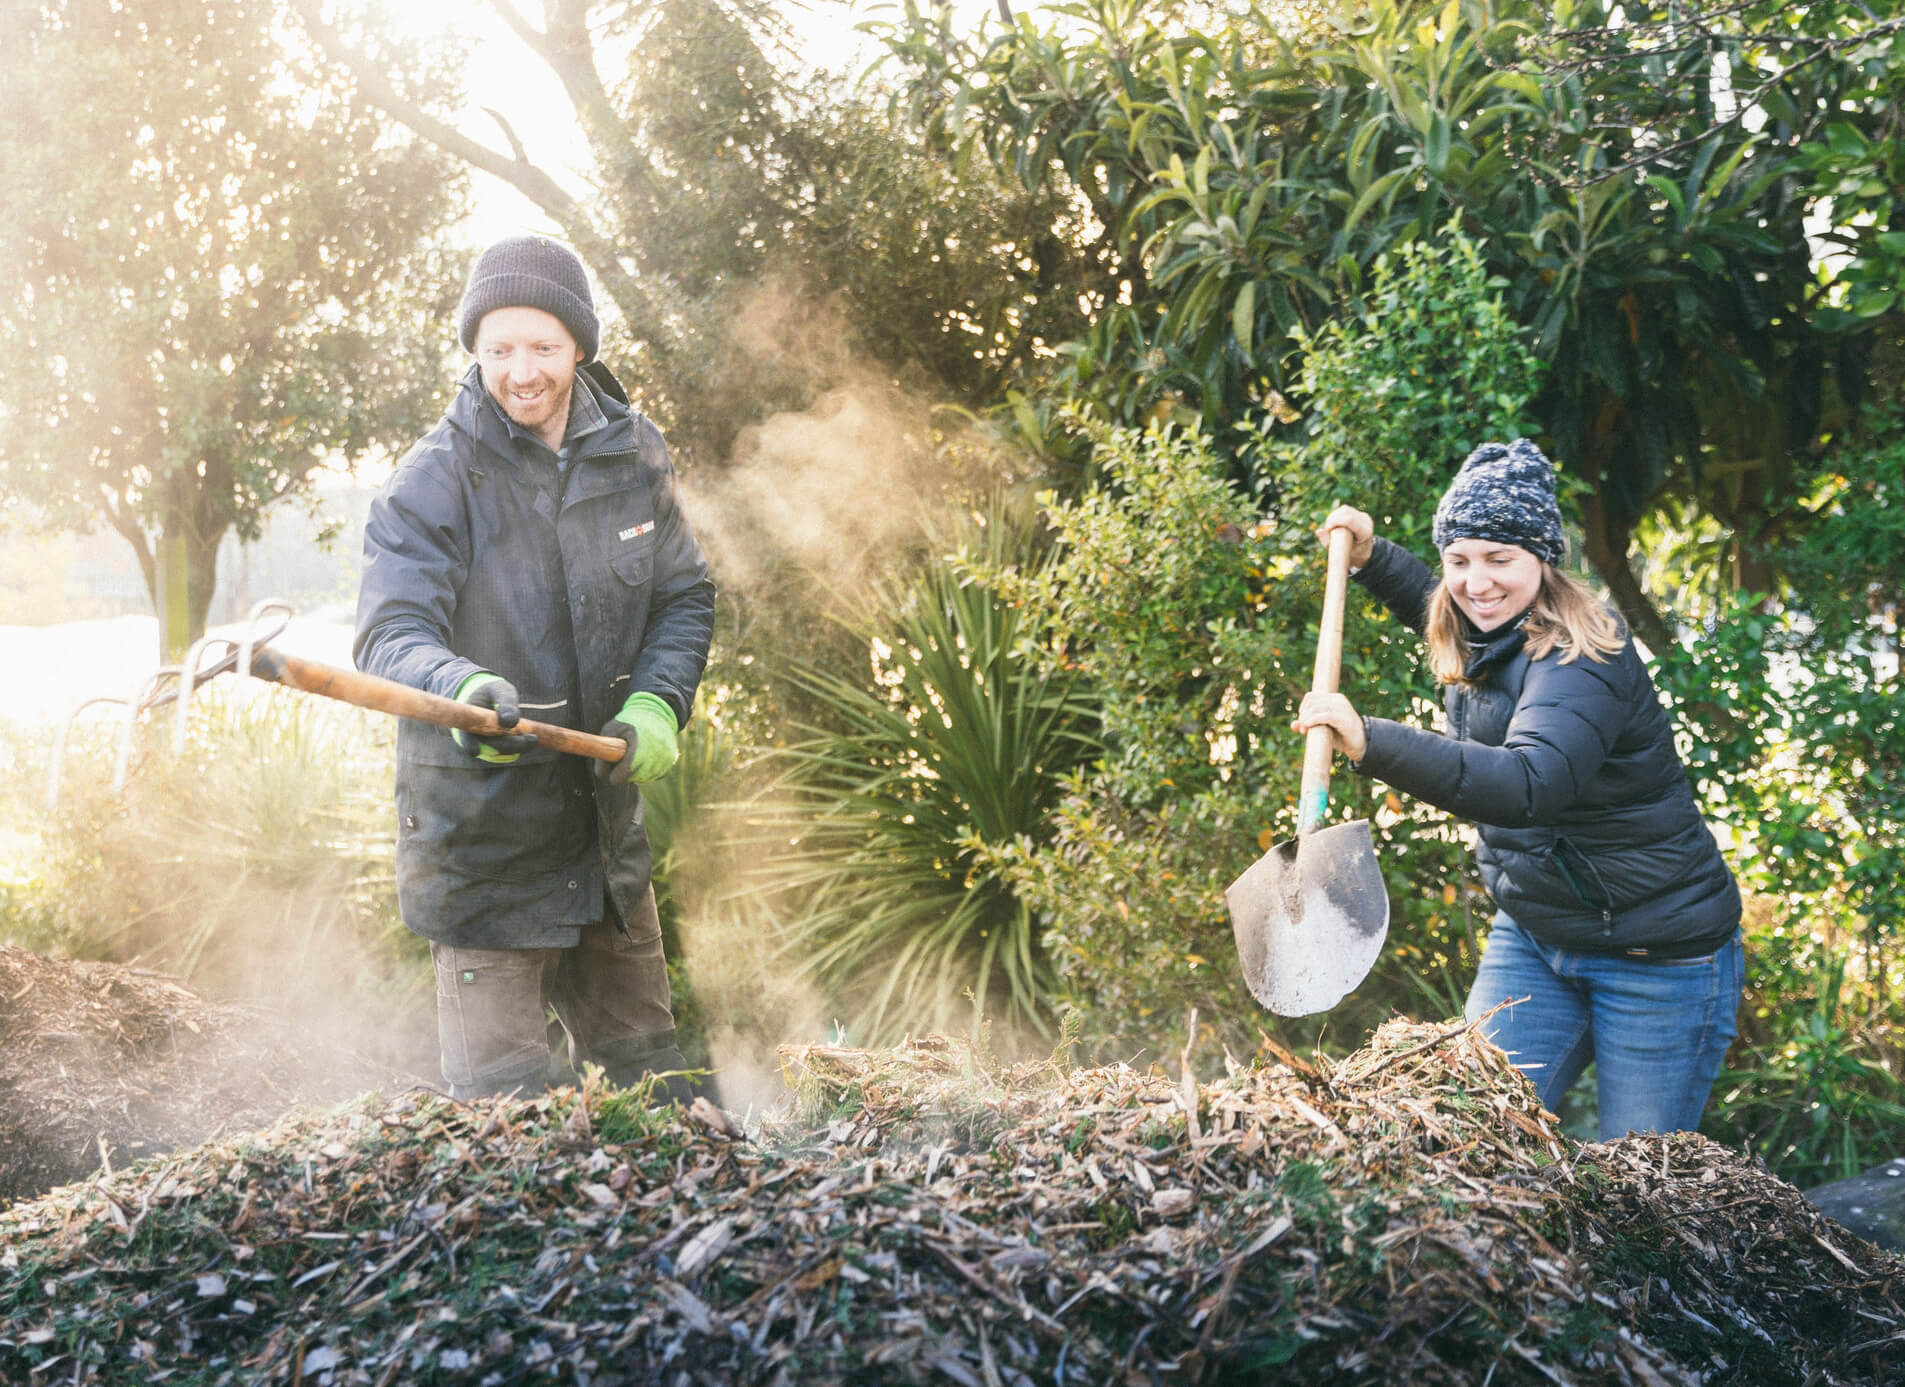 MeetPomegranate Kitchen - Wellington, Hospitality,Refugee Employment, Refugees